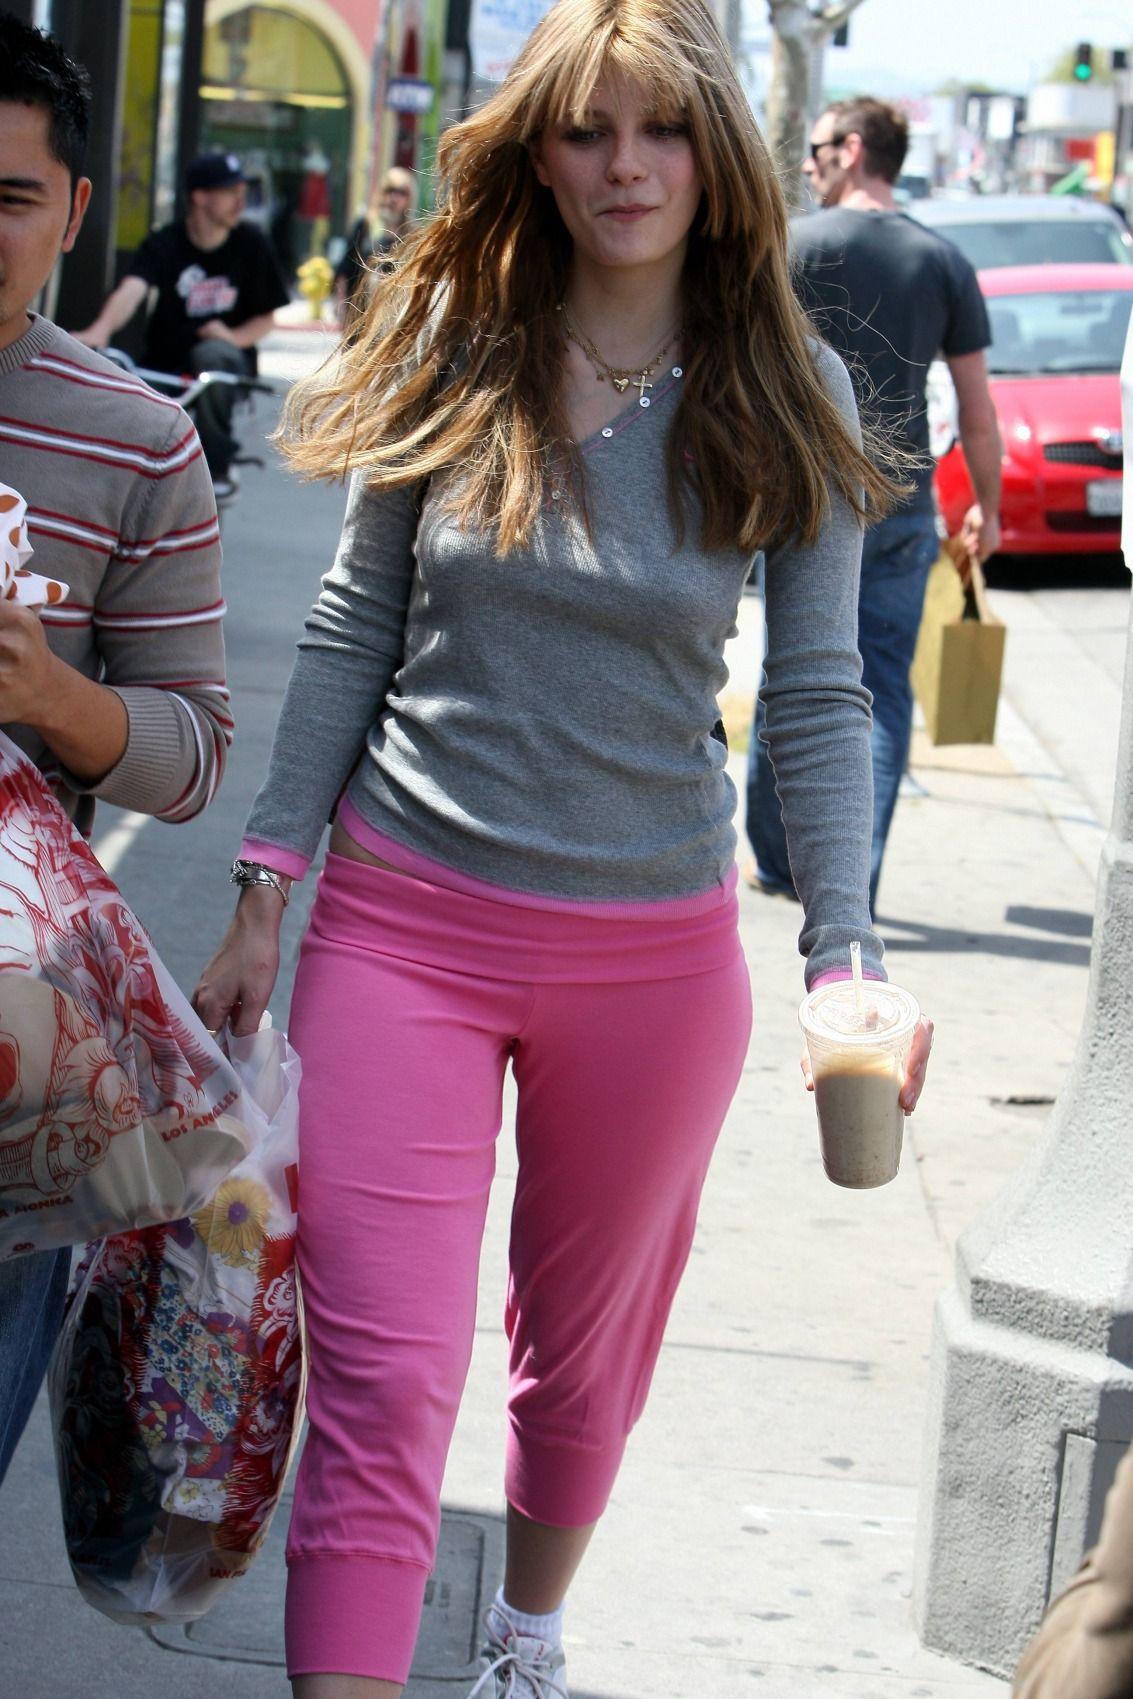 Mischa Barton smooth pants | Best Mischa Barton feet and ... Mischa Barton Facebook